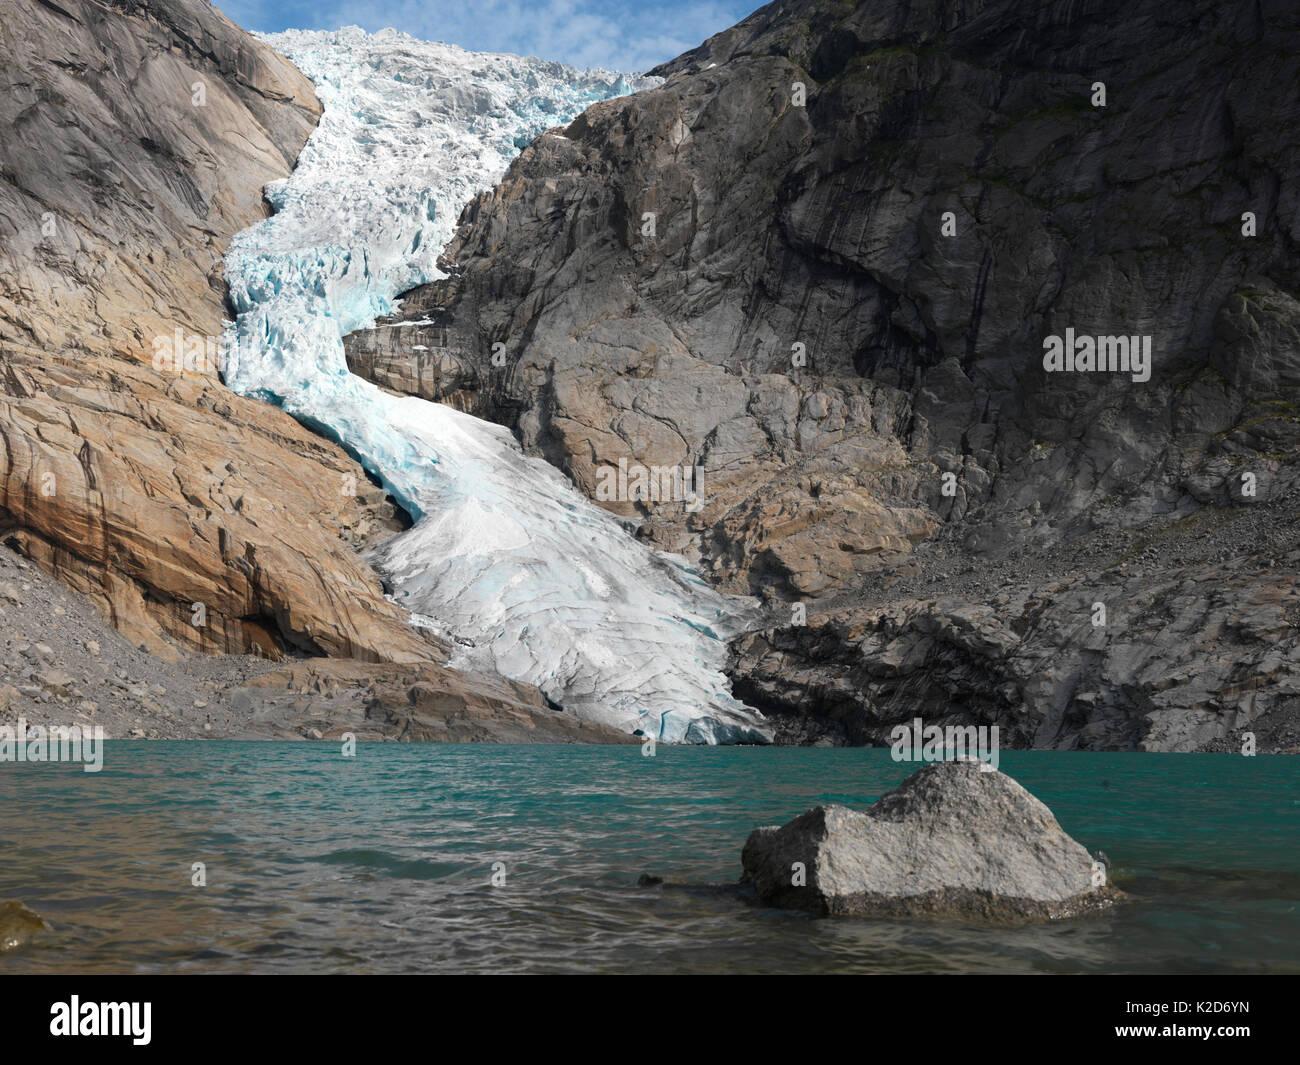 Jostedalsbreen Glacier Norway Stock Photos Amp Jostedalsbreen Glacier Norway Stock Images Alamy